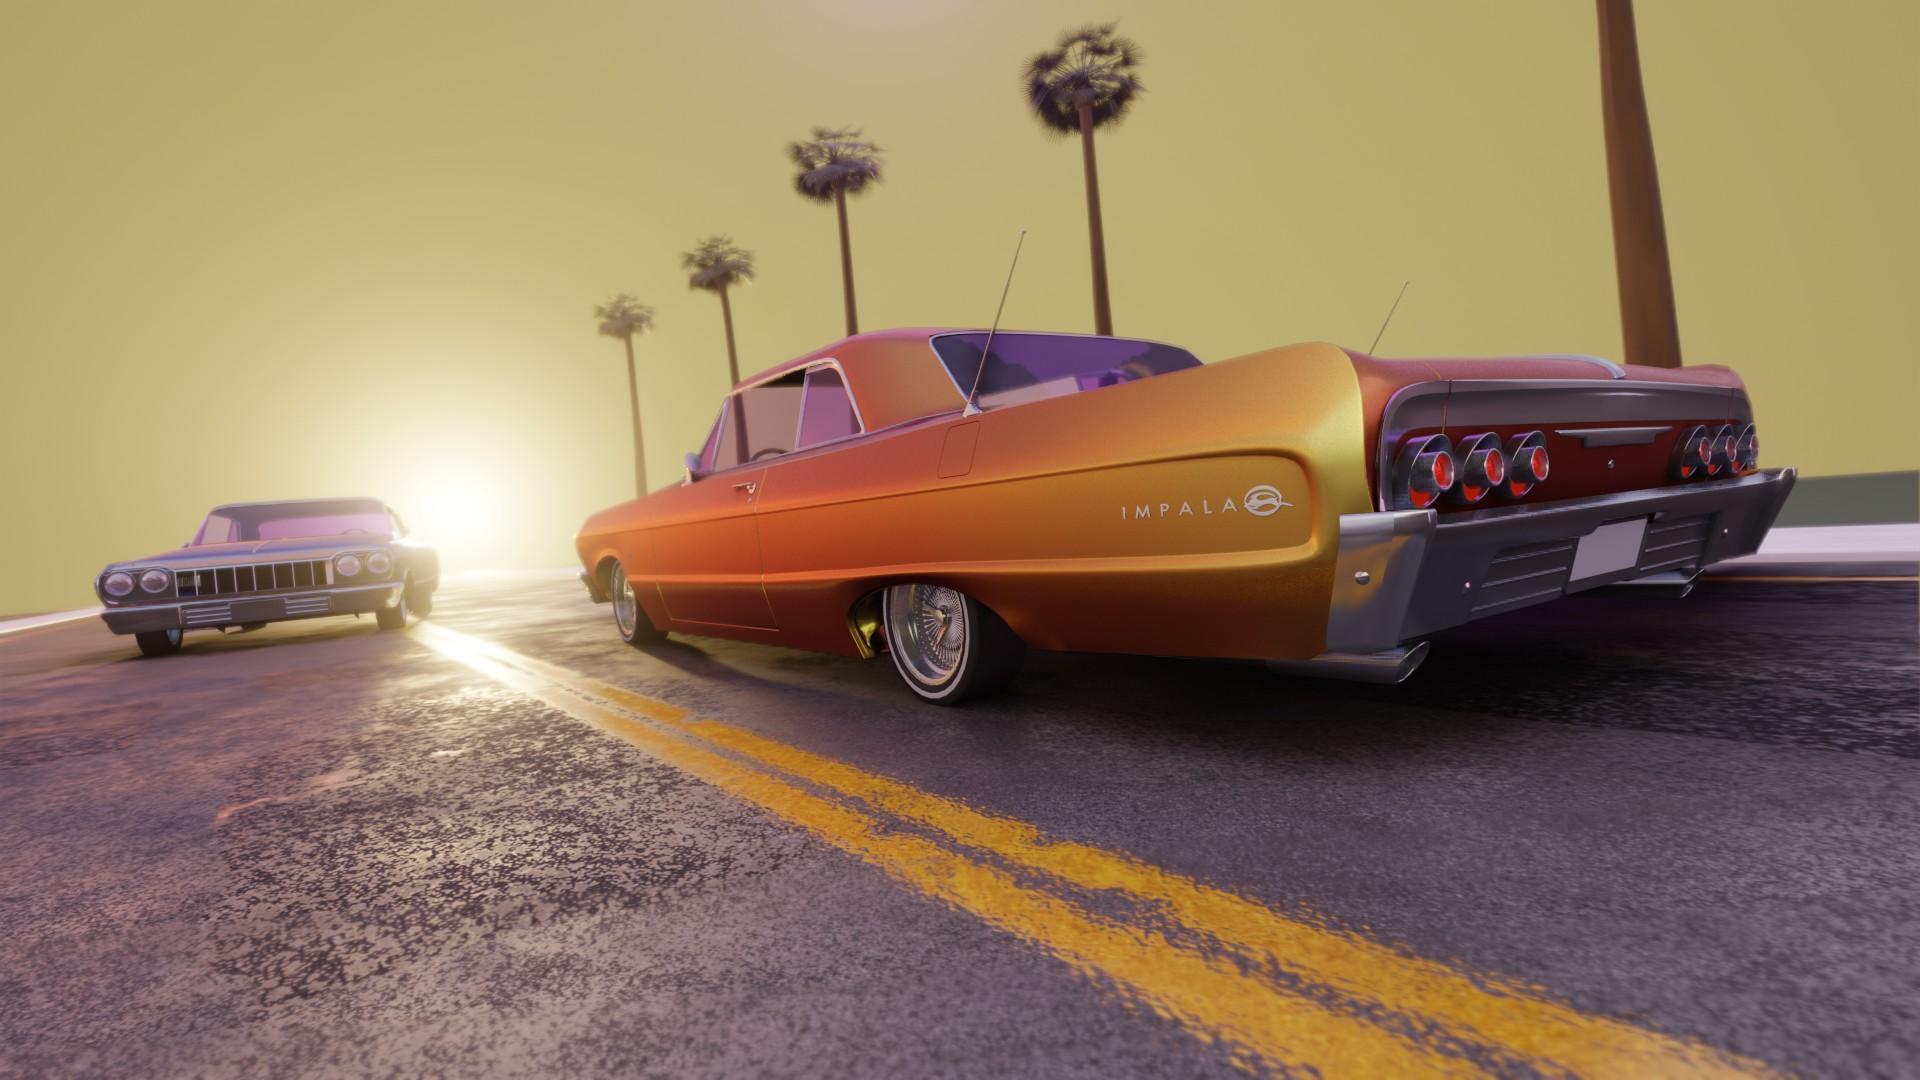 1964 Impala Low Rider - 2020 Hum3D Car Challenge